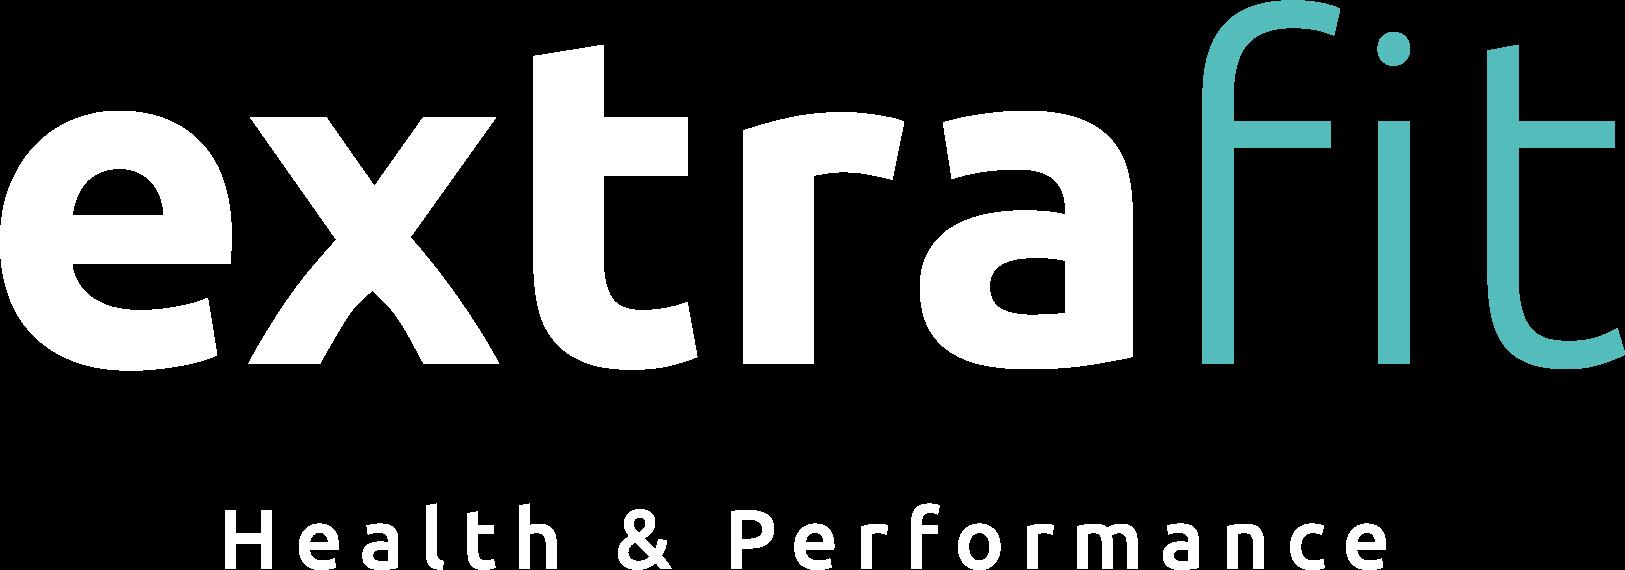 7088_Extrafit_logo_Footer_standard